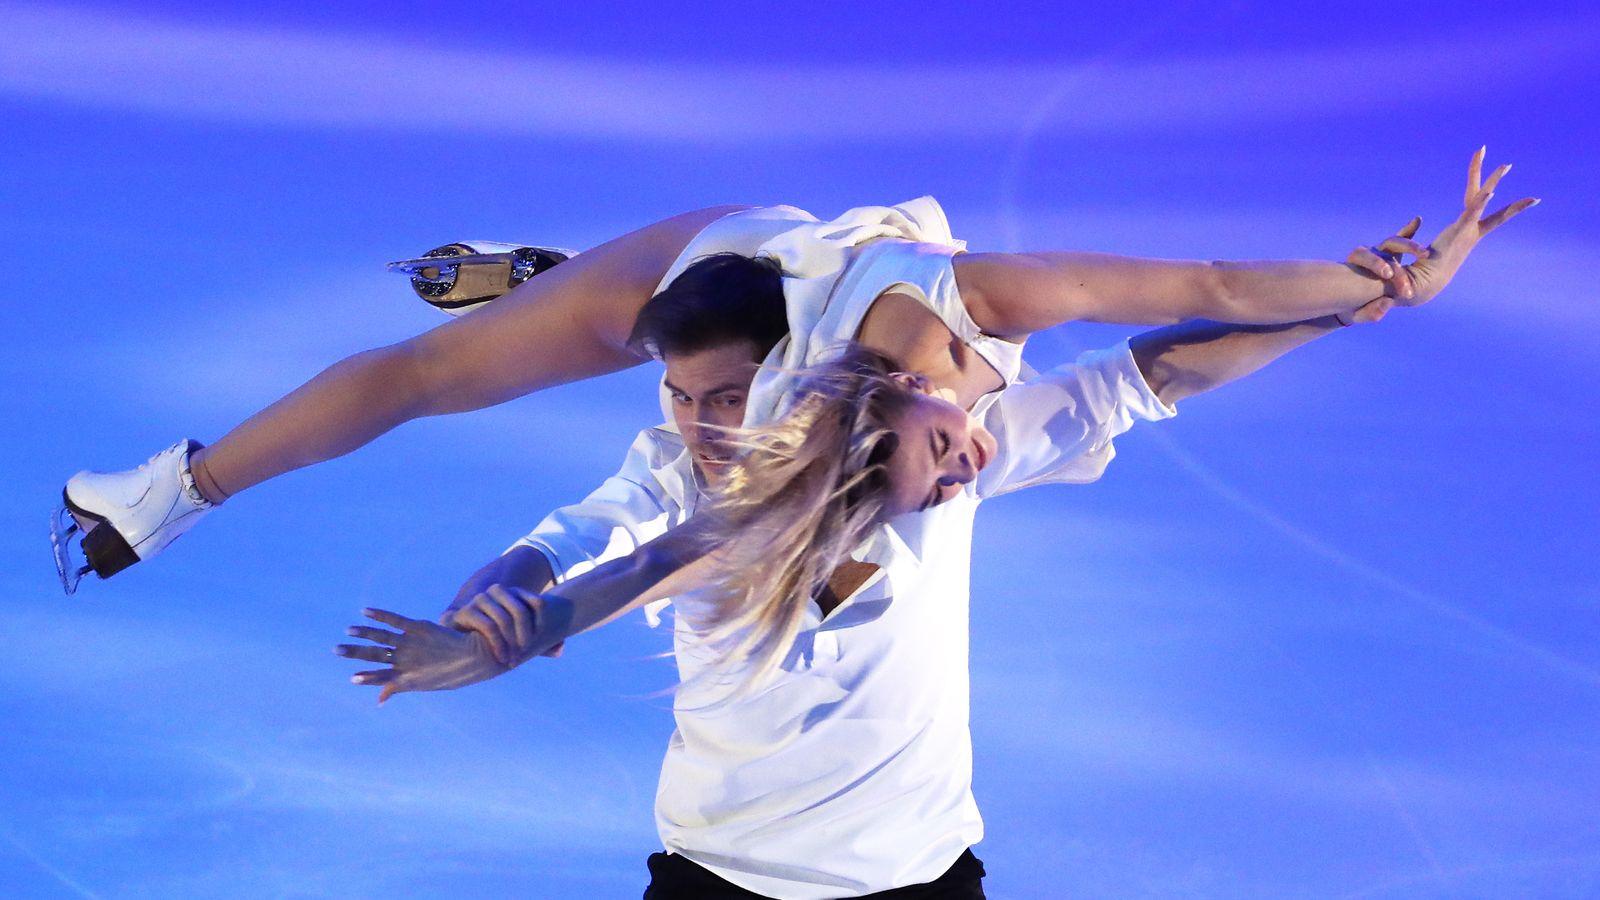 Coupe de Russie 2020 | Gala   Grand Prix ISU 2020 2021   Eurosport